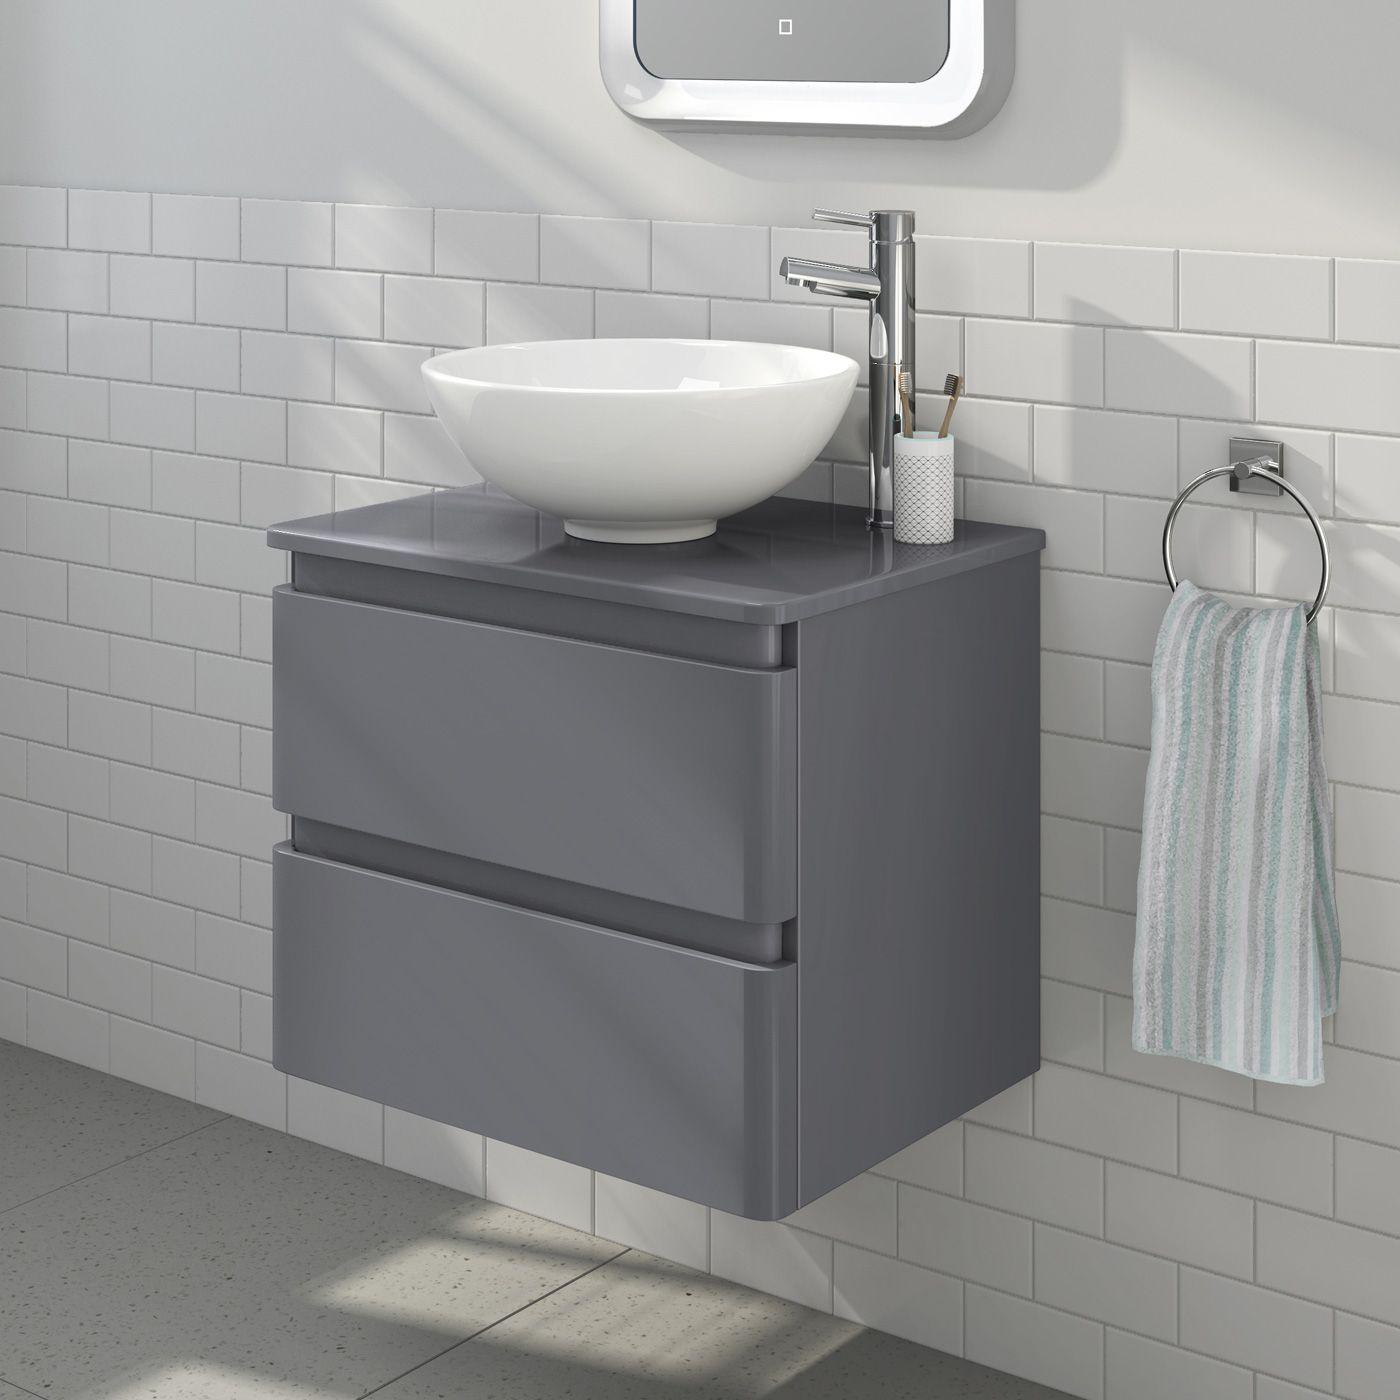 600mm Denver Ii Gloss Grey Countertop Unit Basin Wall Hung